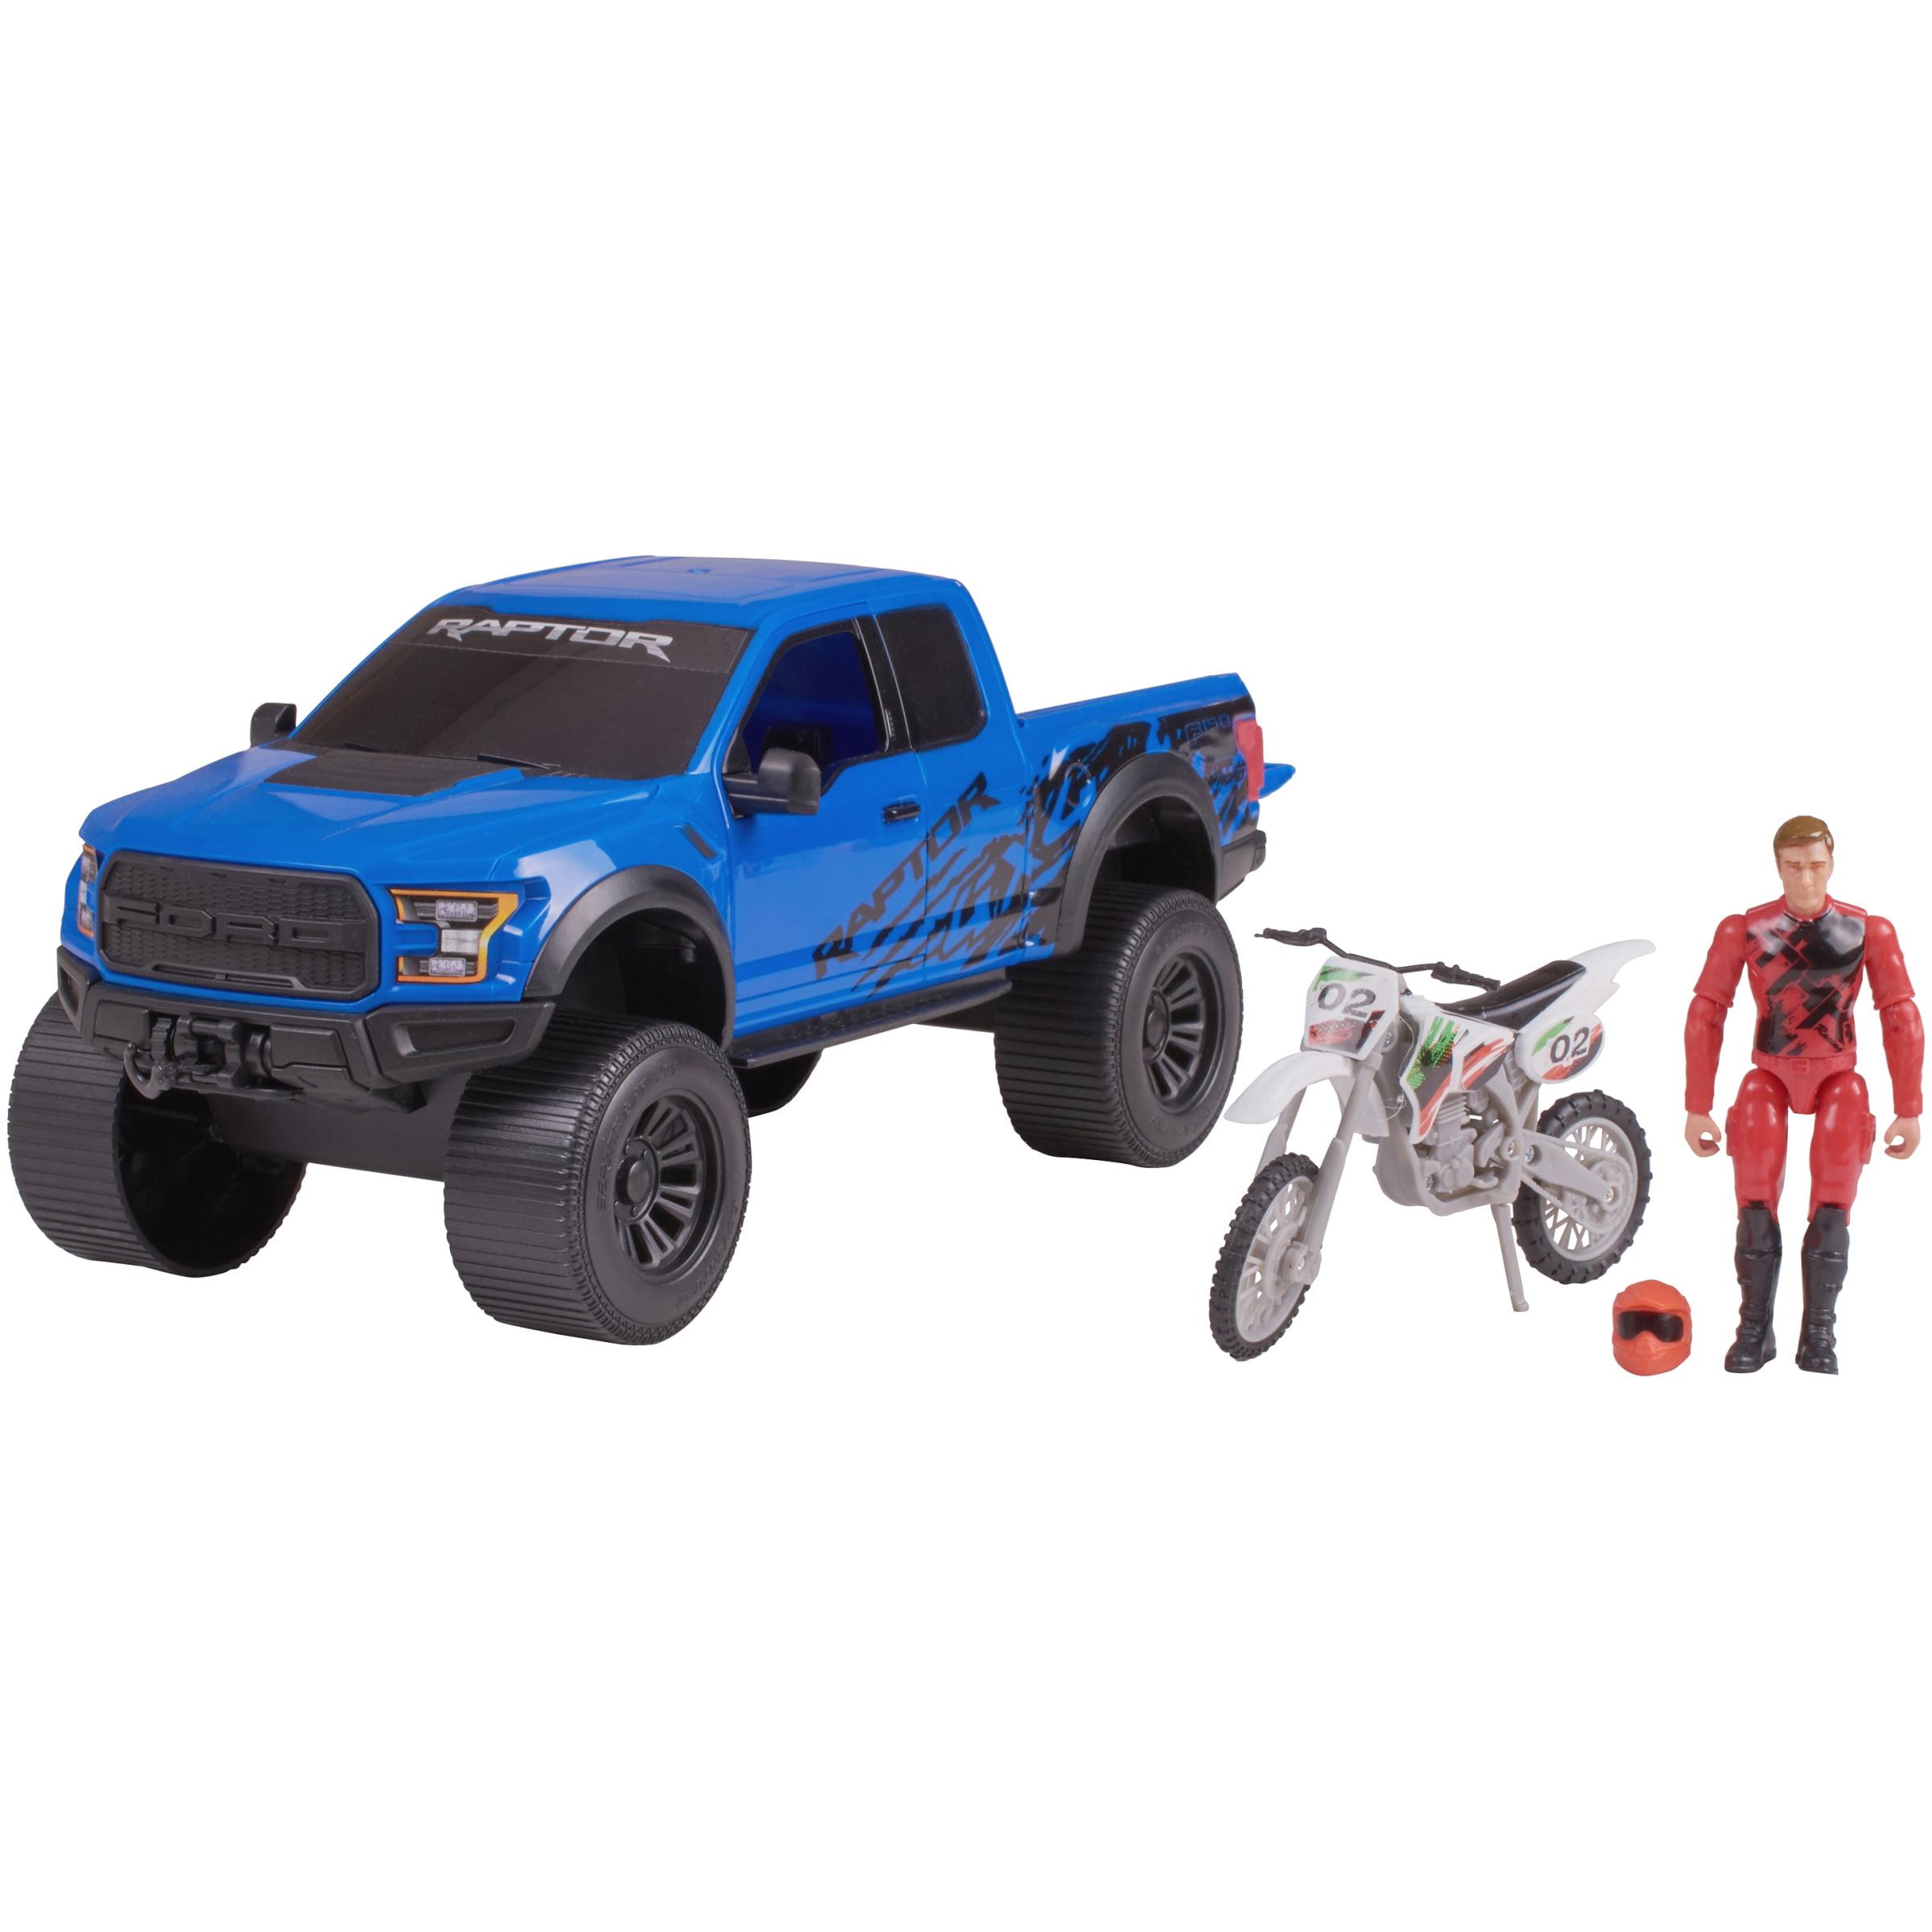 Adventure Force Outdoor Adventure Vehicle Set, Blue Ford Raptor